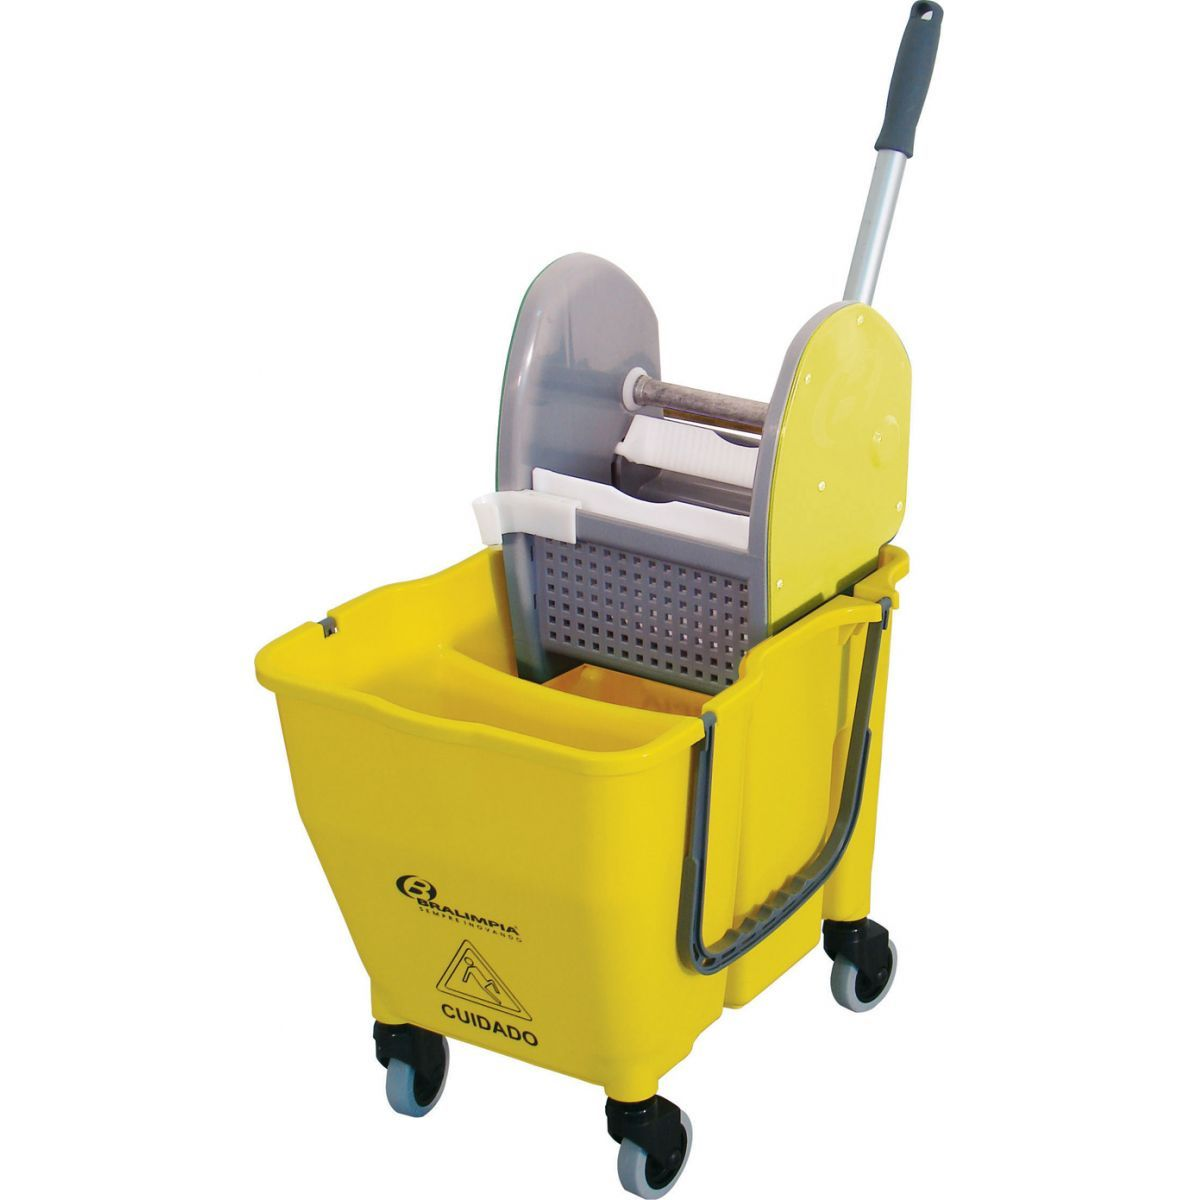 Kit Profissional Carrinho de Limpeza Completo - Bralimpia NYKT03 KIT 3